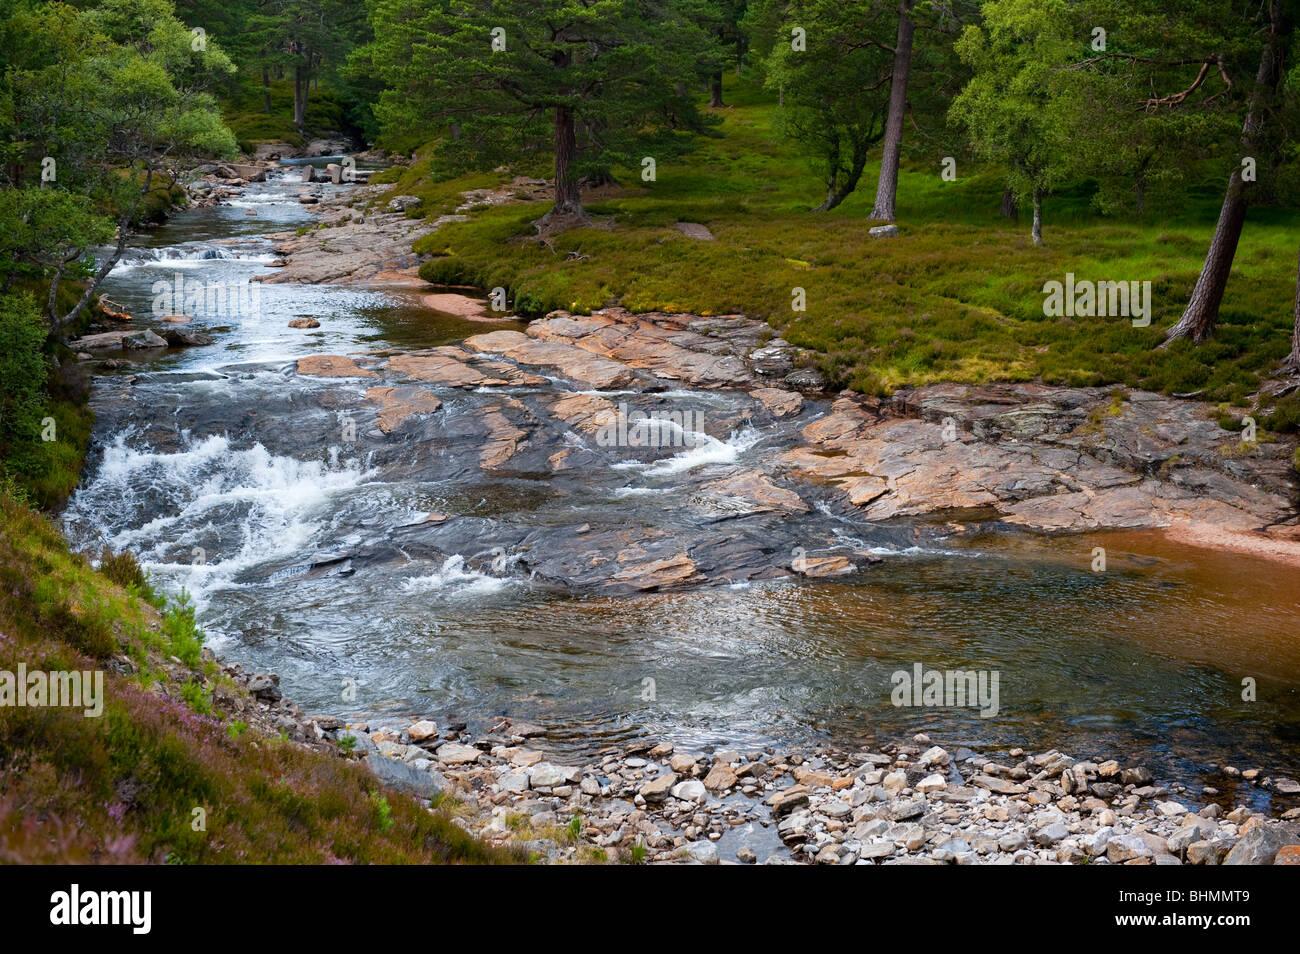 image of river lui near braemar - Stock Image